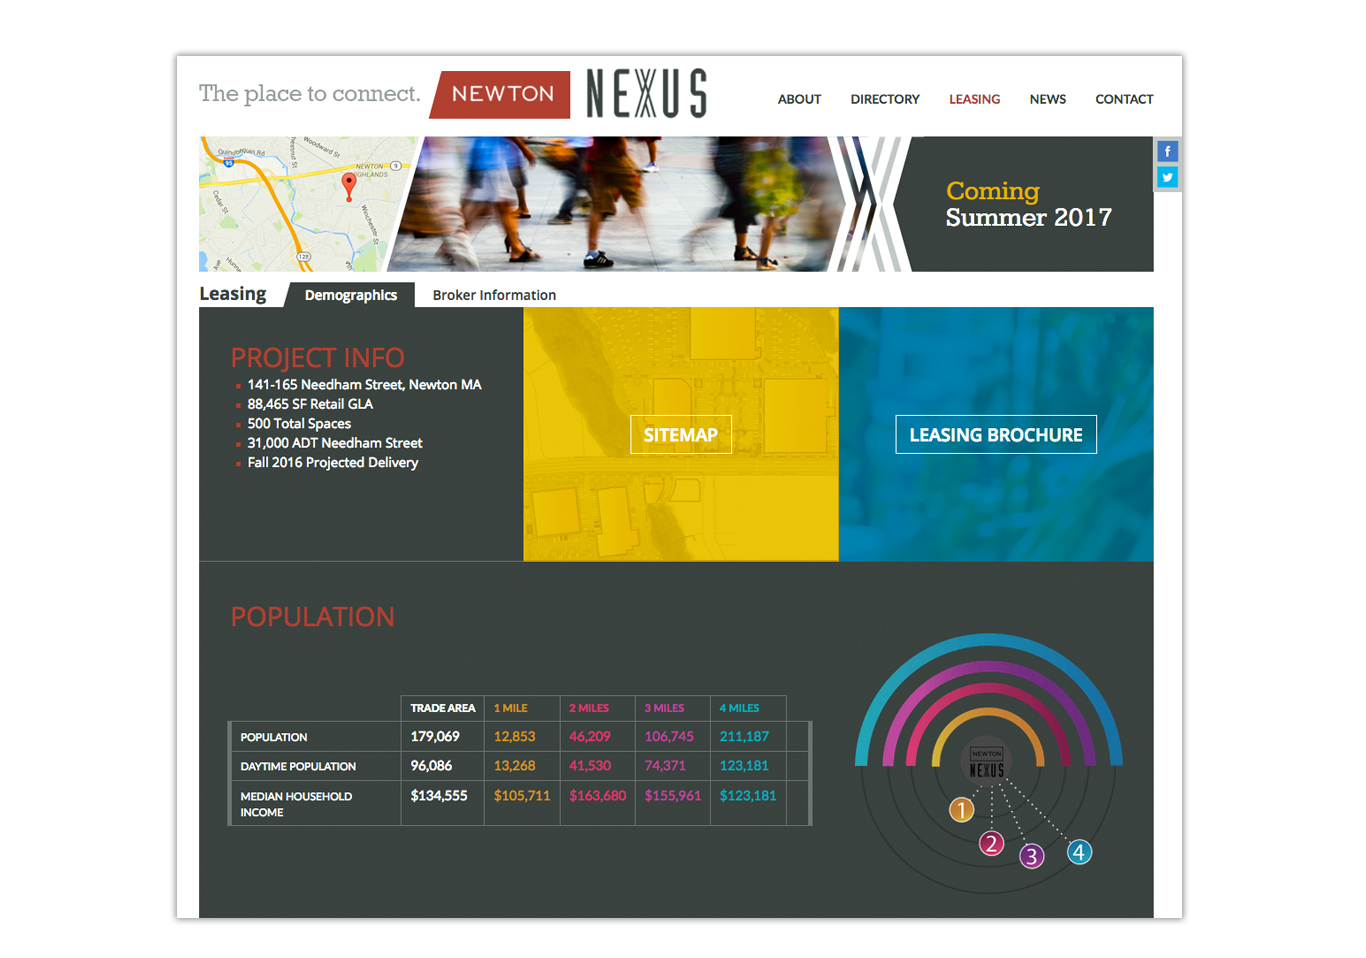 web-nexus-image-3